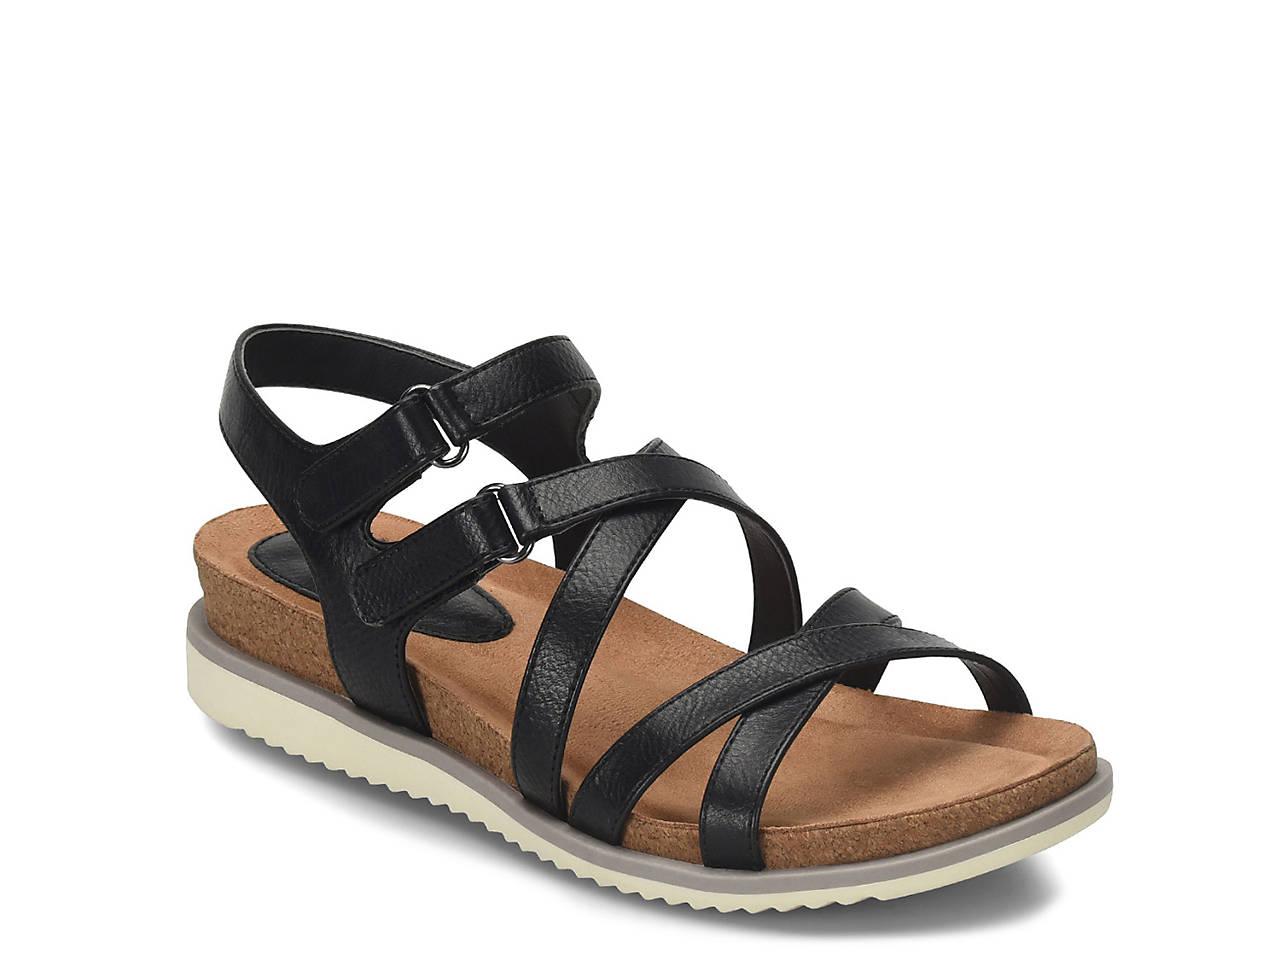 a40f44df9693 Eurosoft Lina Wedge Sandal Women s Shoes